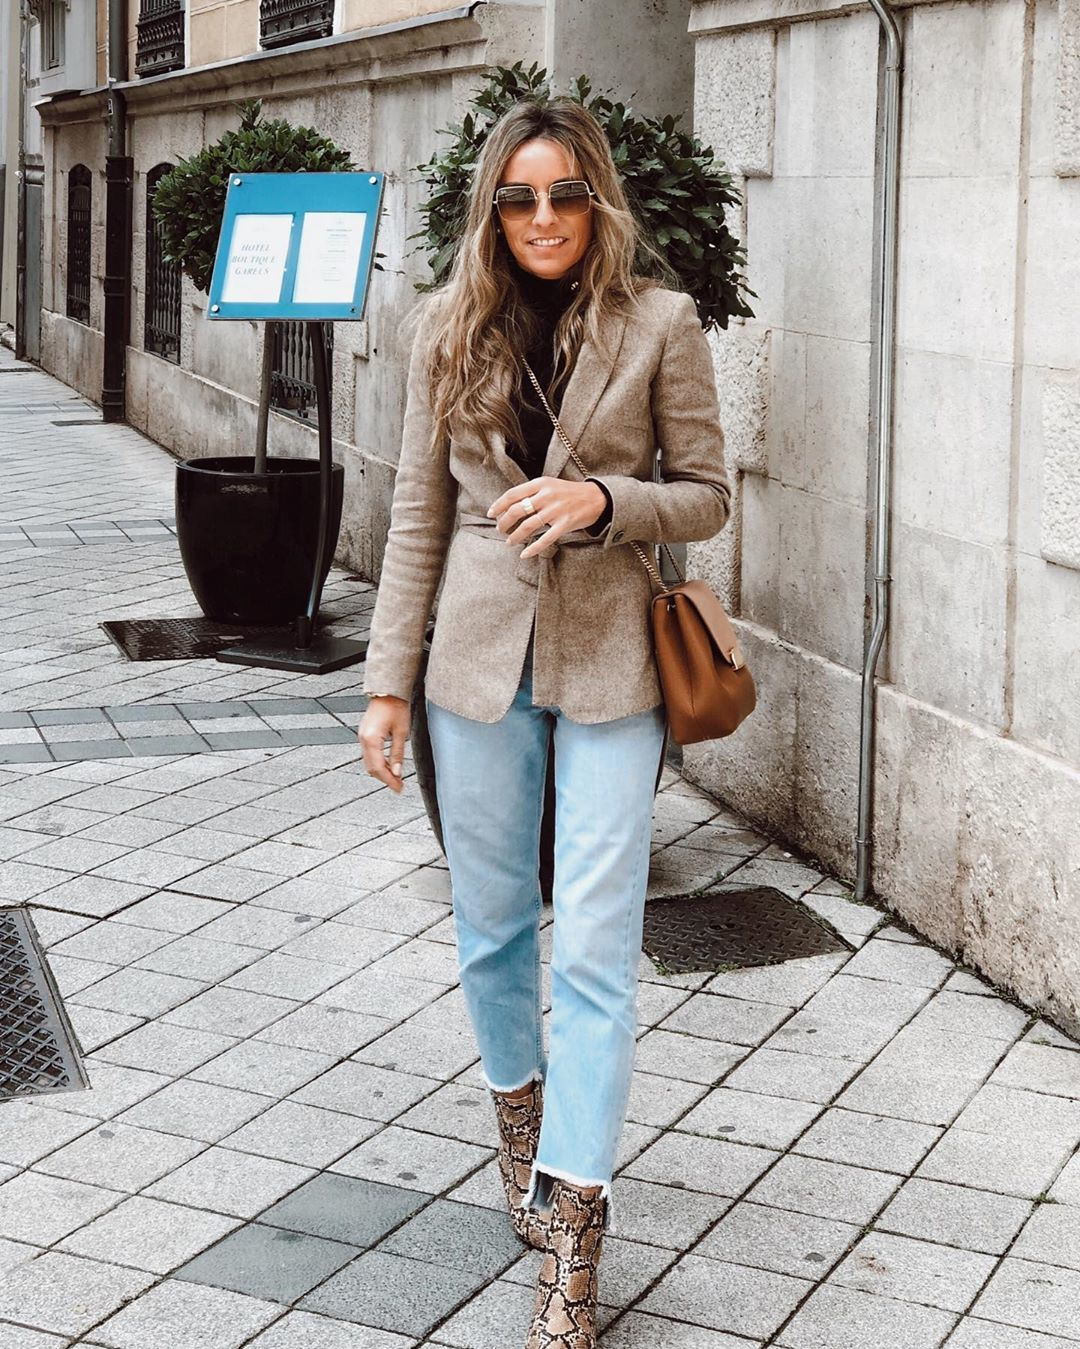 jeans straight jeans ankle boots snake print blazer turtleneck crossbody bag